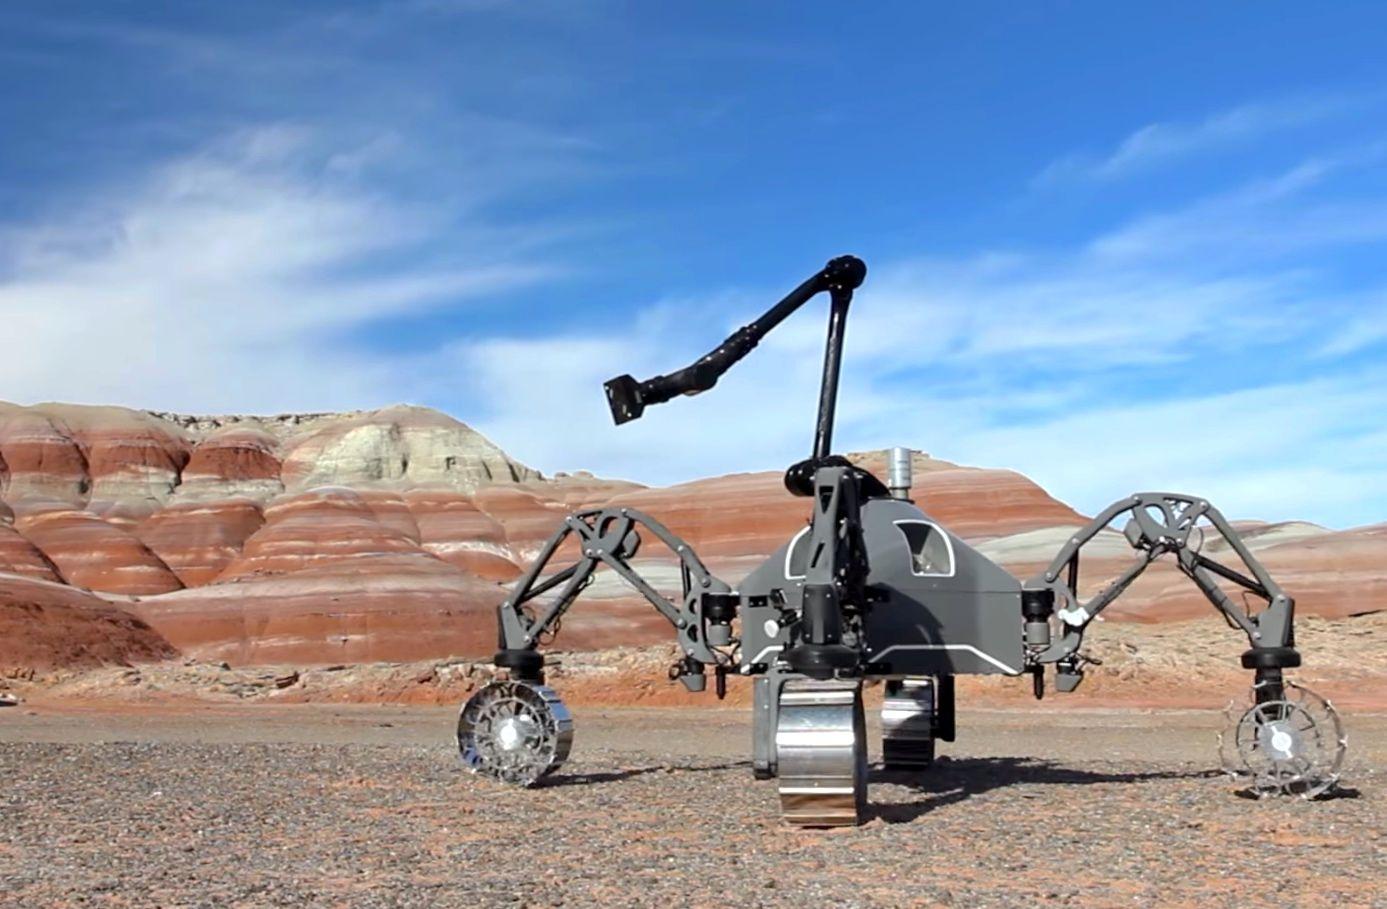 DFKI Mars rover test in Utah